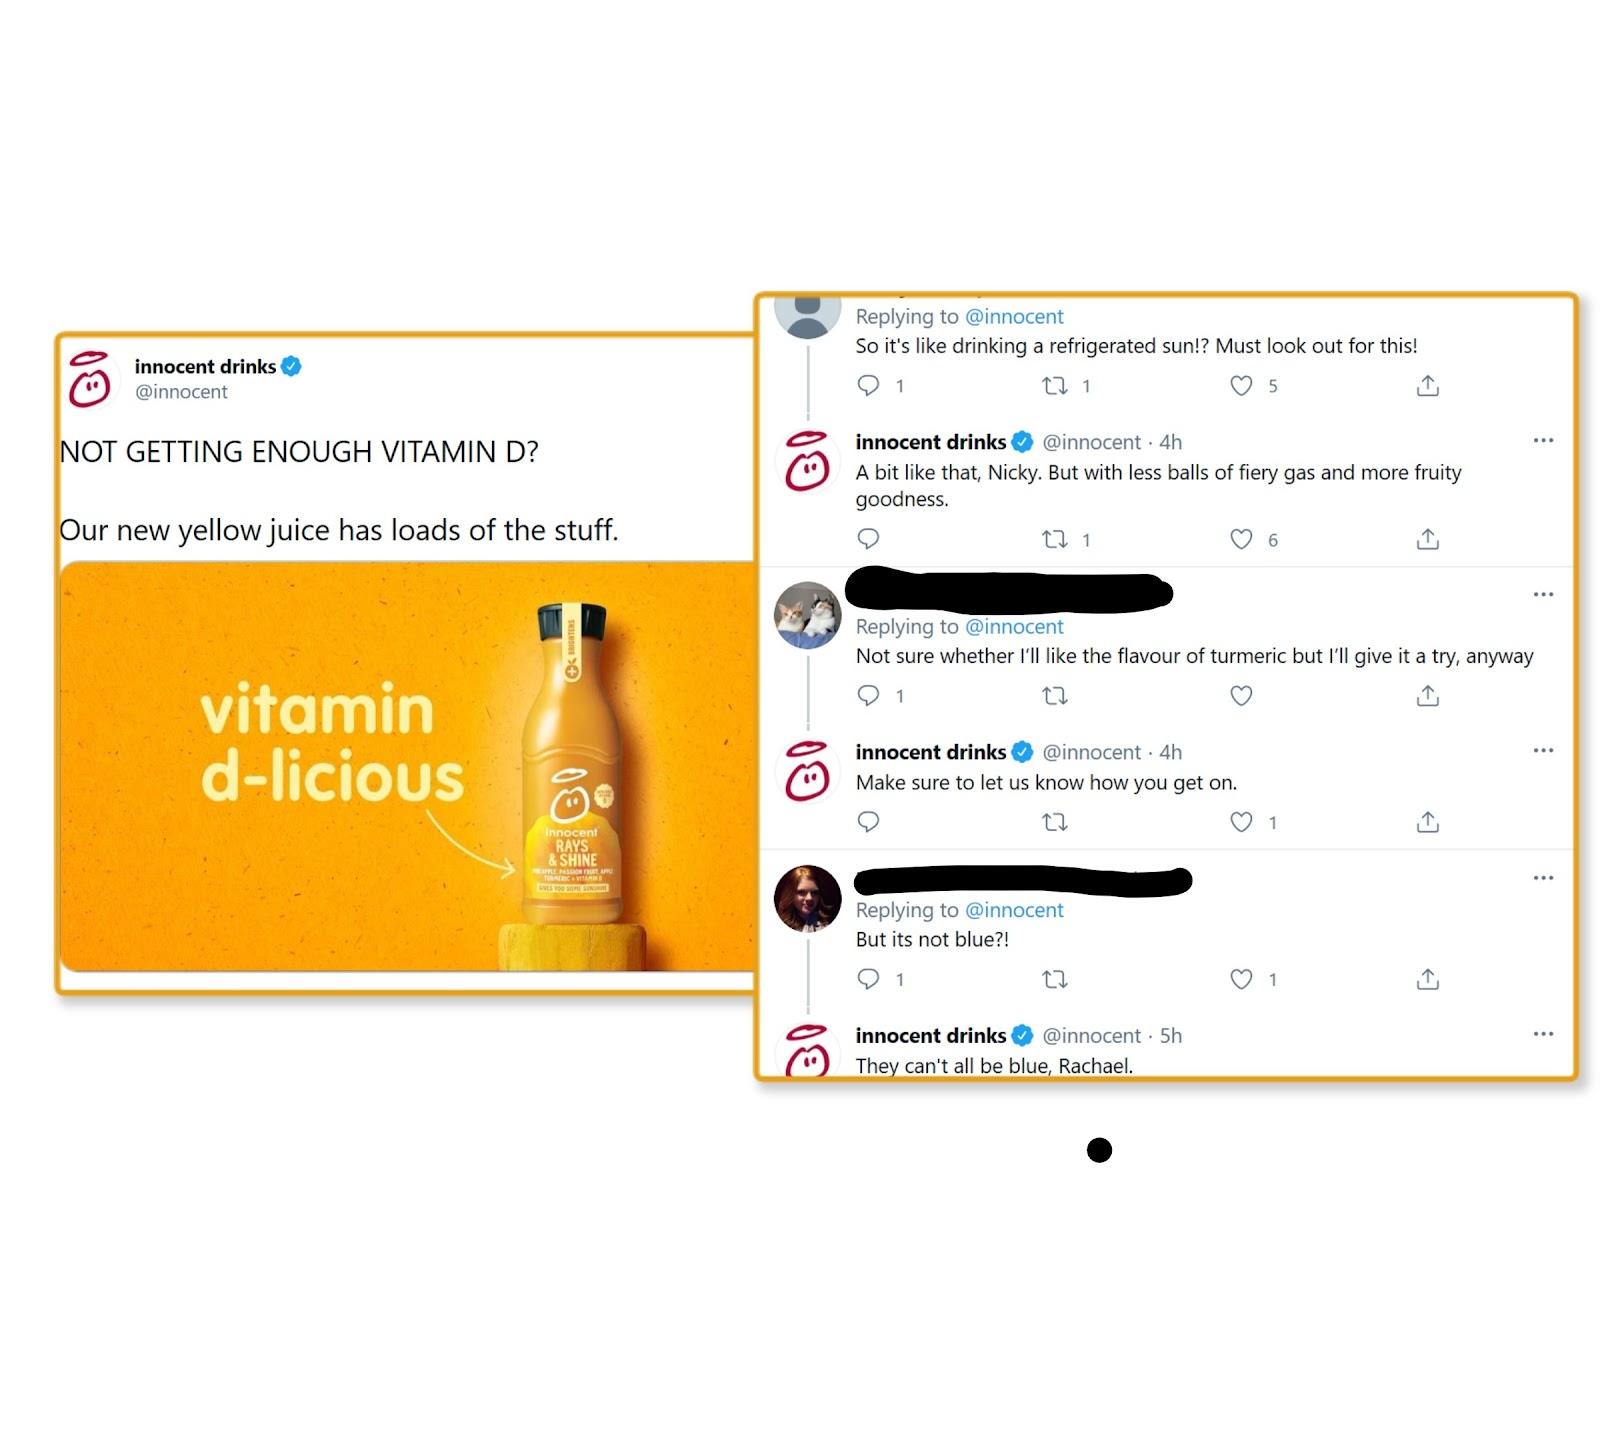 innocent drinks customer replies on twitter